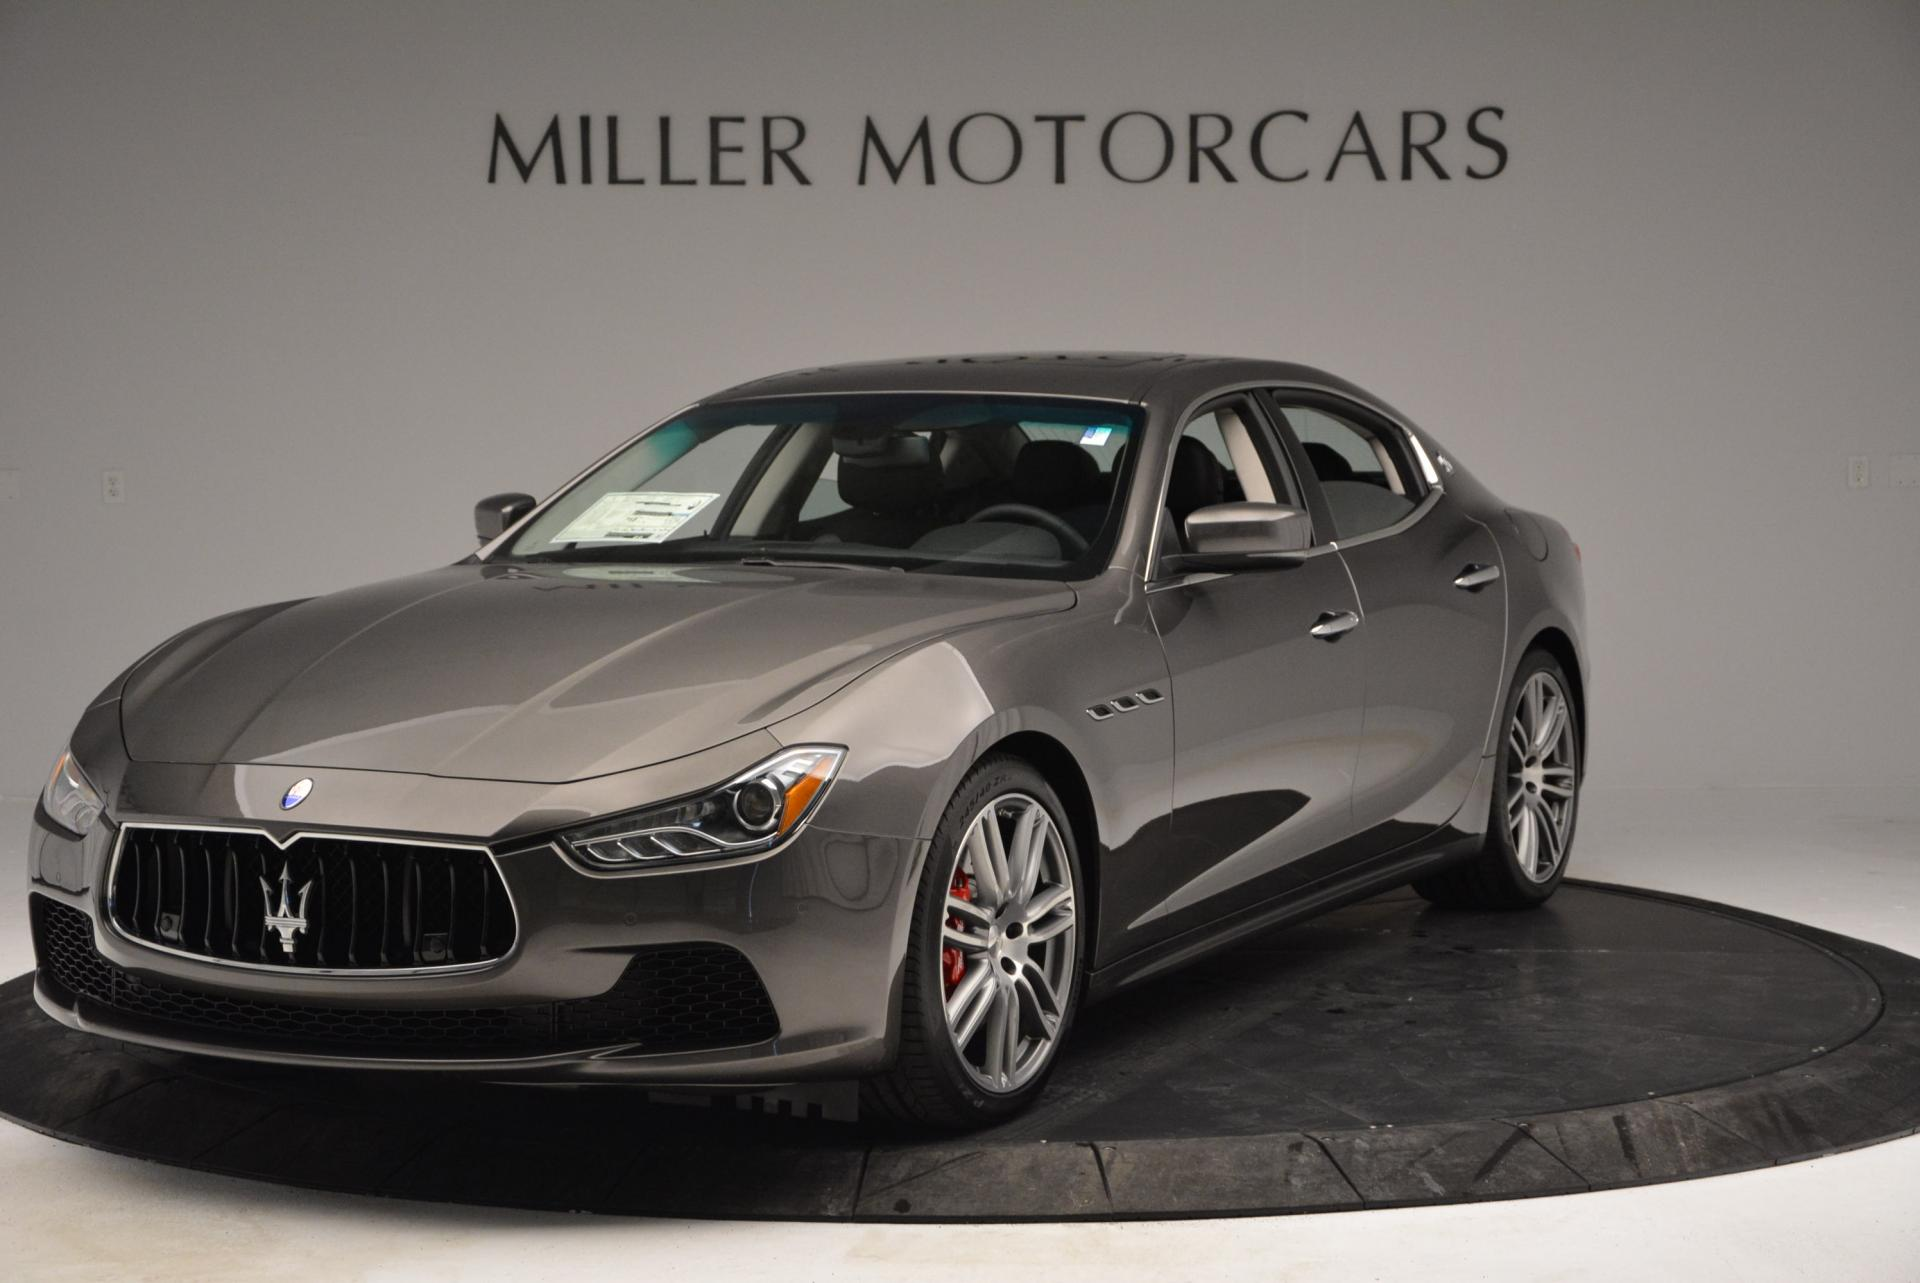 New 2016 Maserati Ghibli S Q4 For Sale In Greenwich, CT 173_main